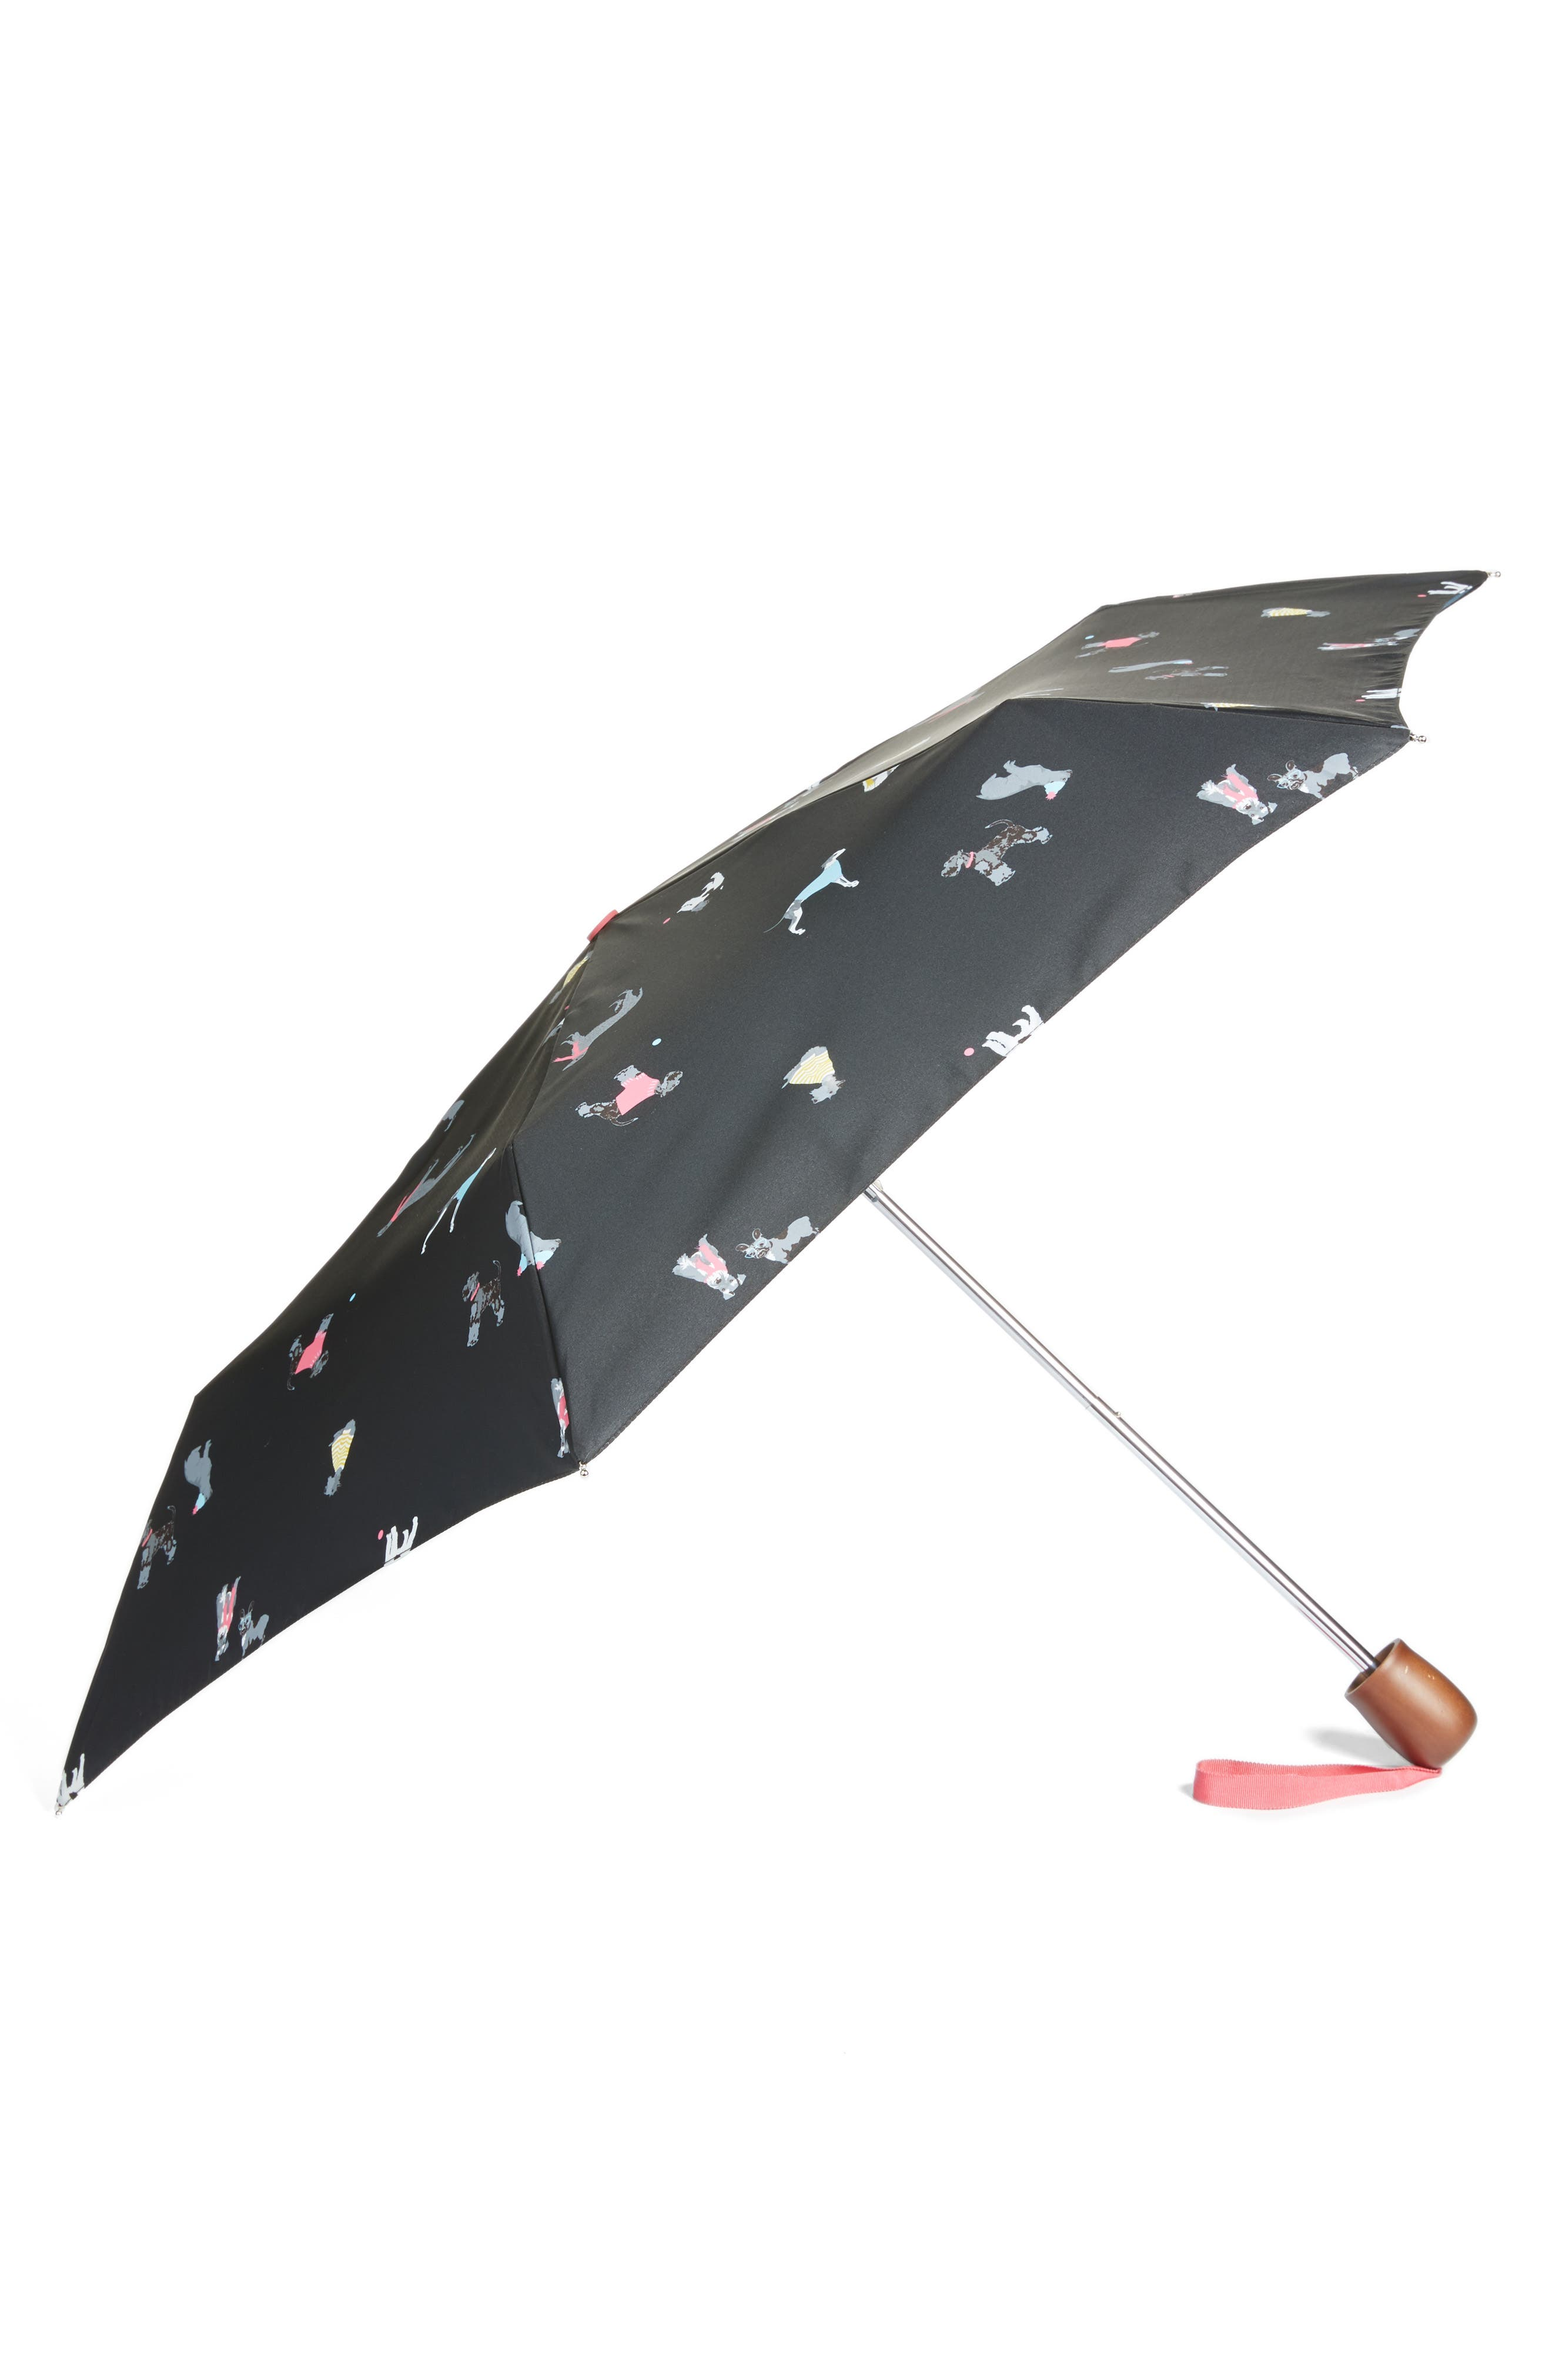 Right as Rain Umbrella,                             Main thumbnail 1, color,                             015